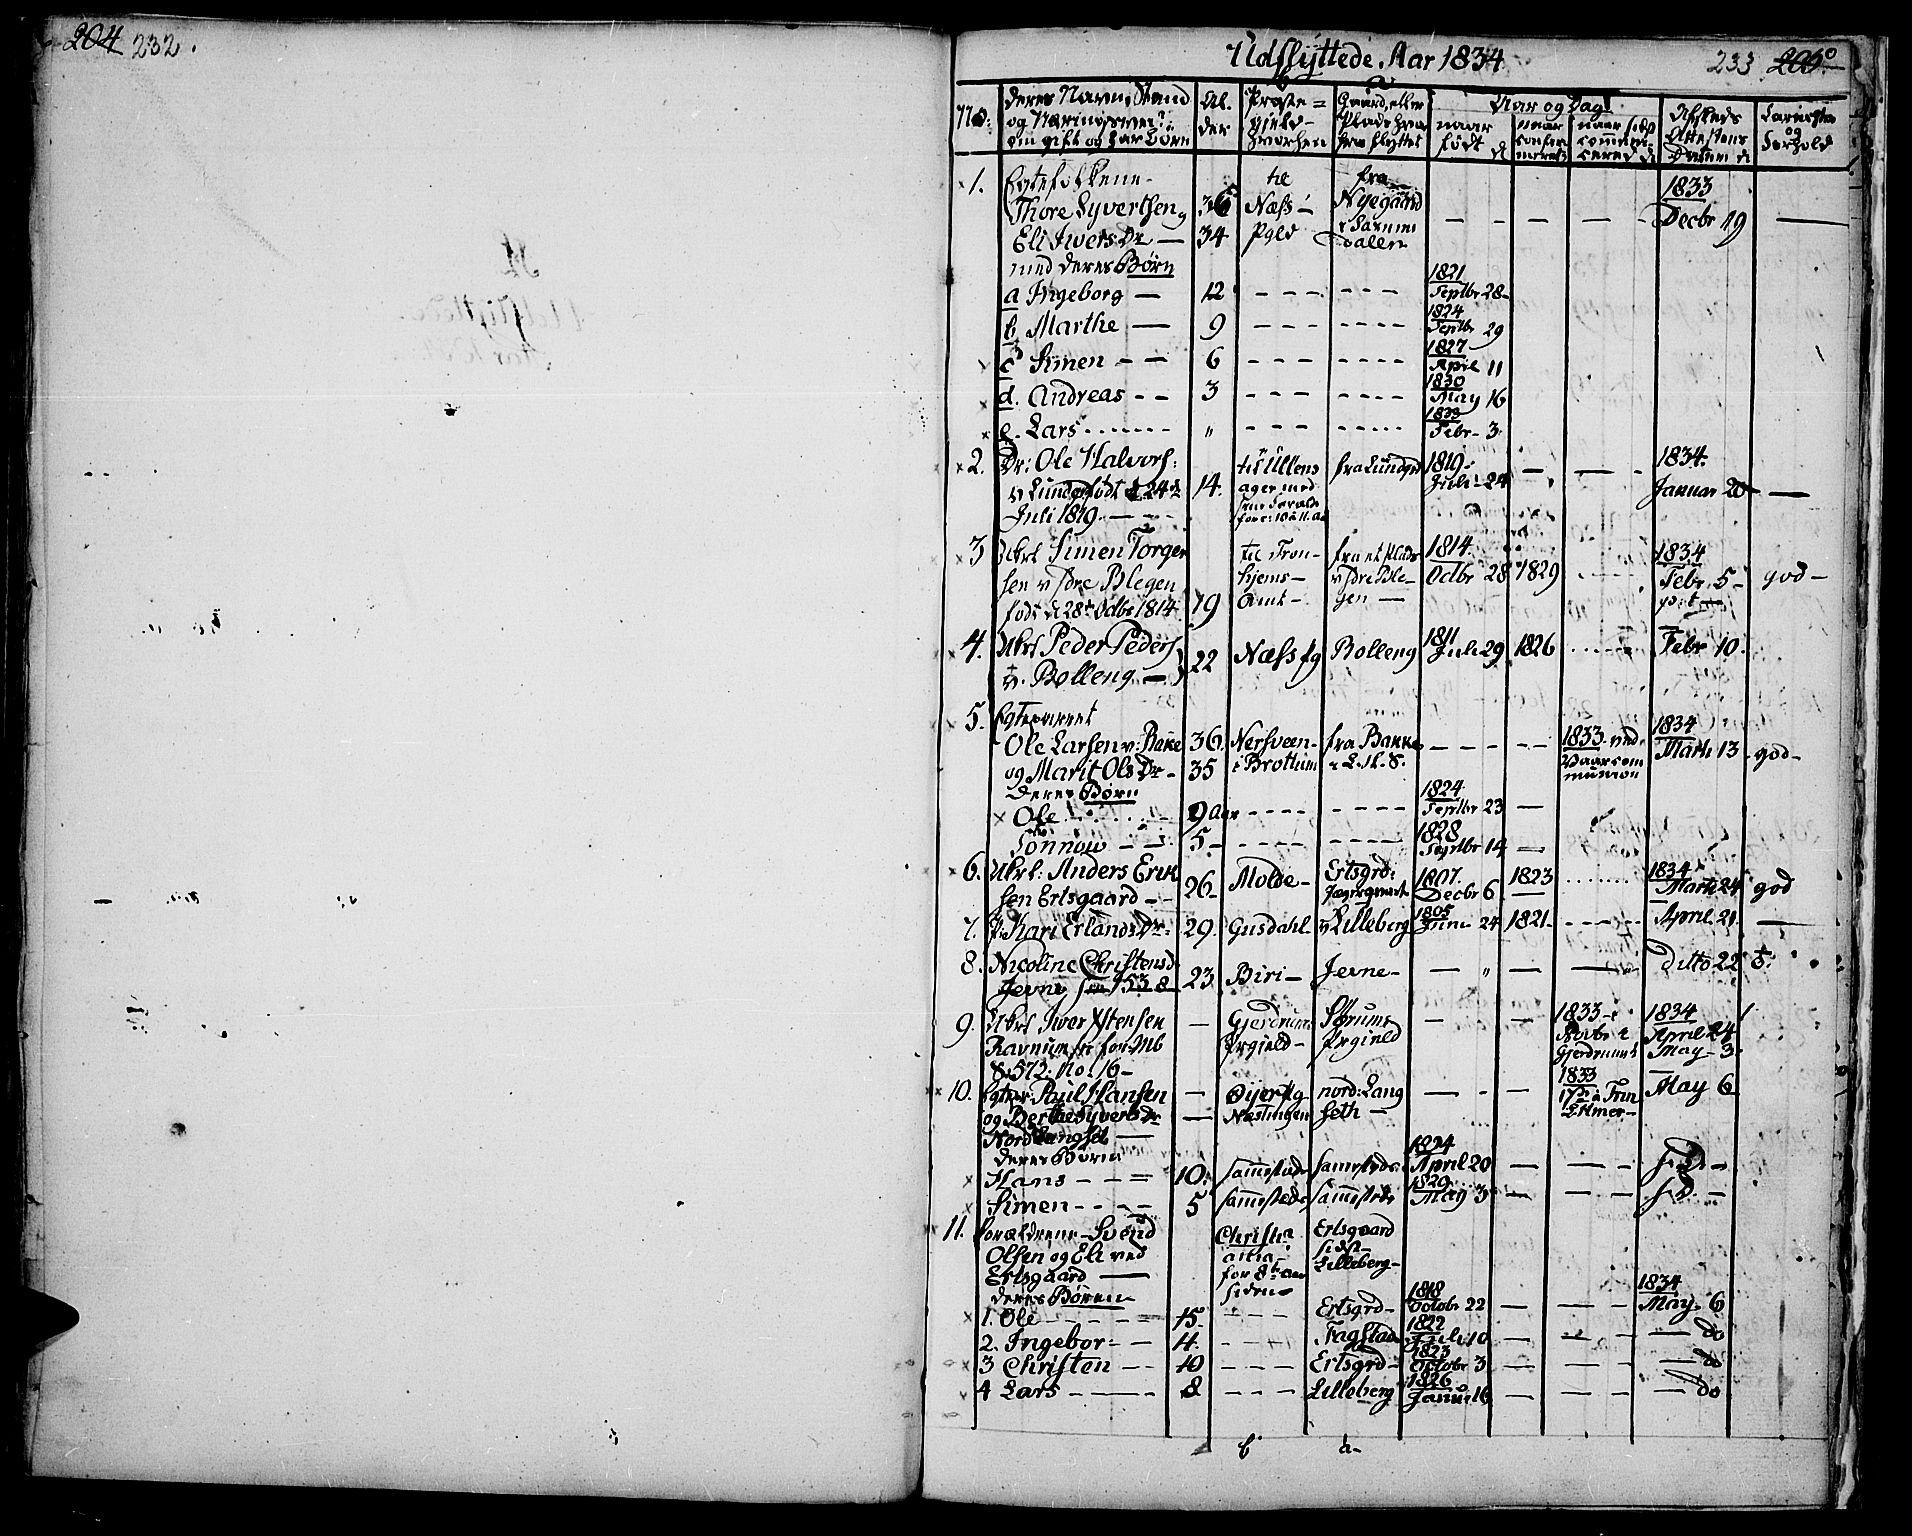 SAH, Fåberg prestekontor, Ministerialbok nr. 4, 1833-1837, s. 232-233